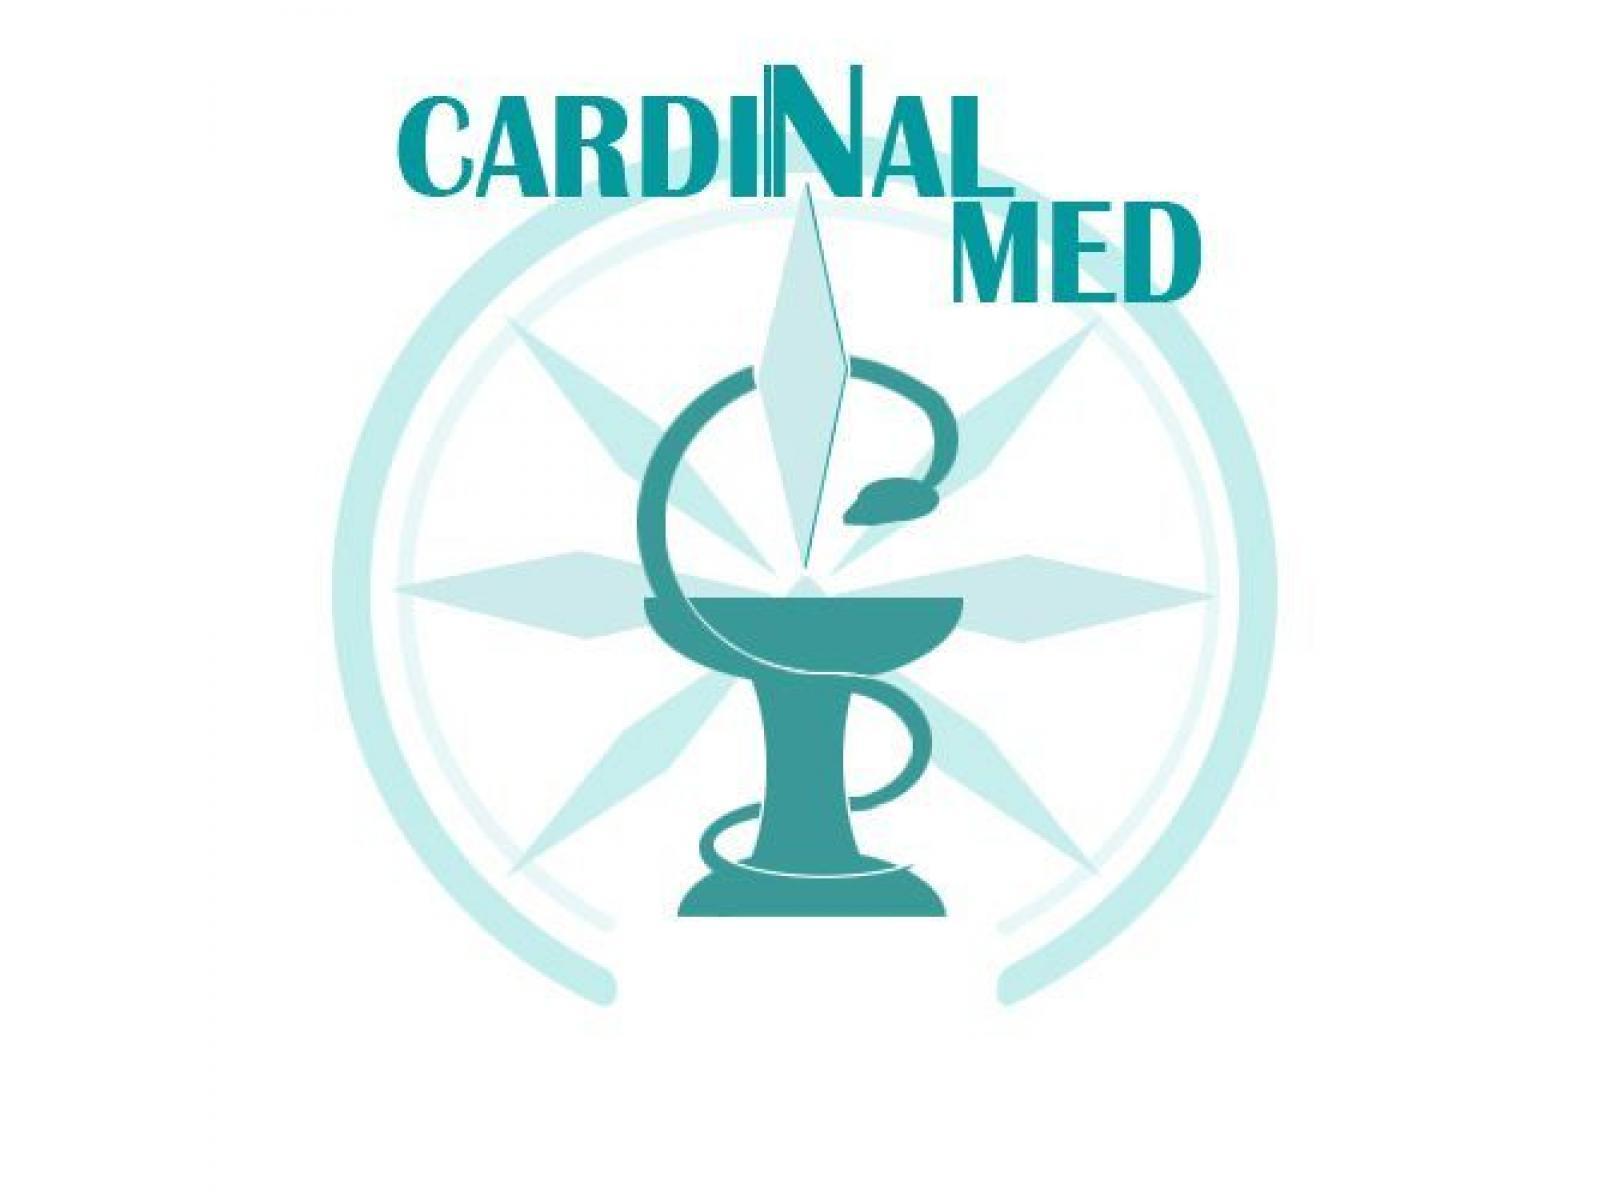 Cardinal Med - 392410_357554844306018_47449821_n.jpg